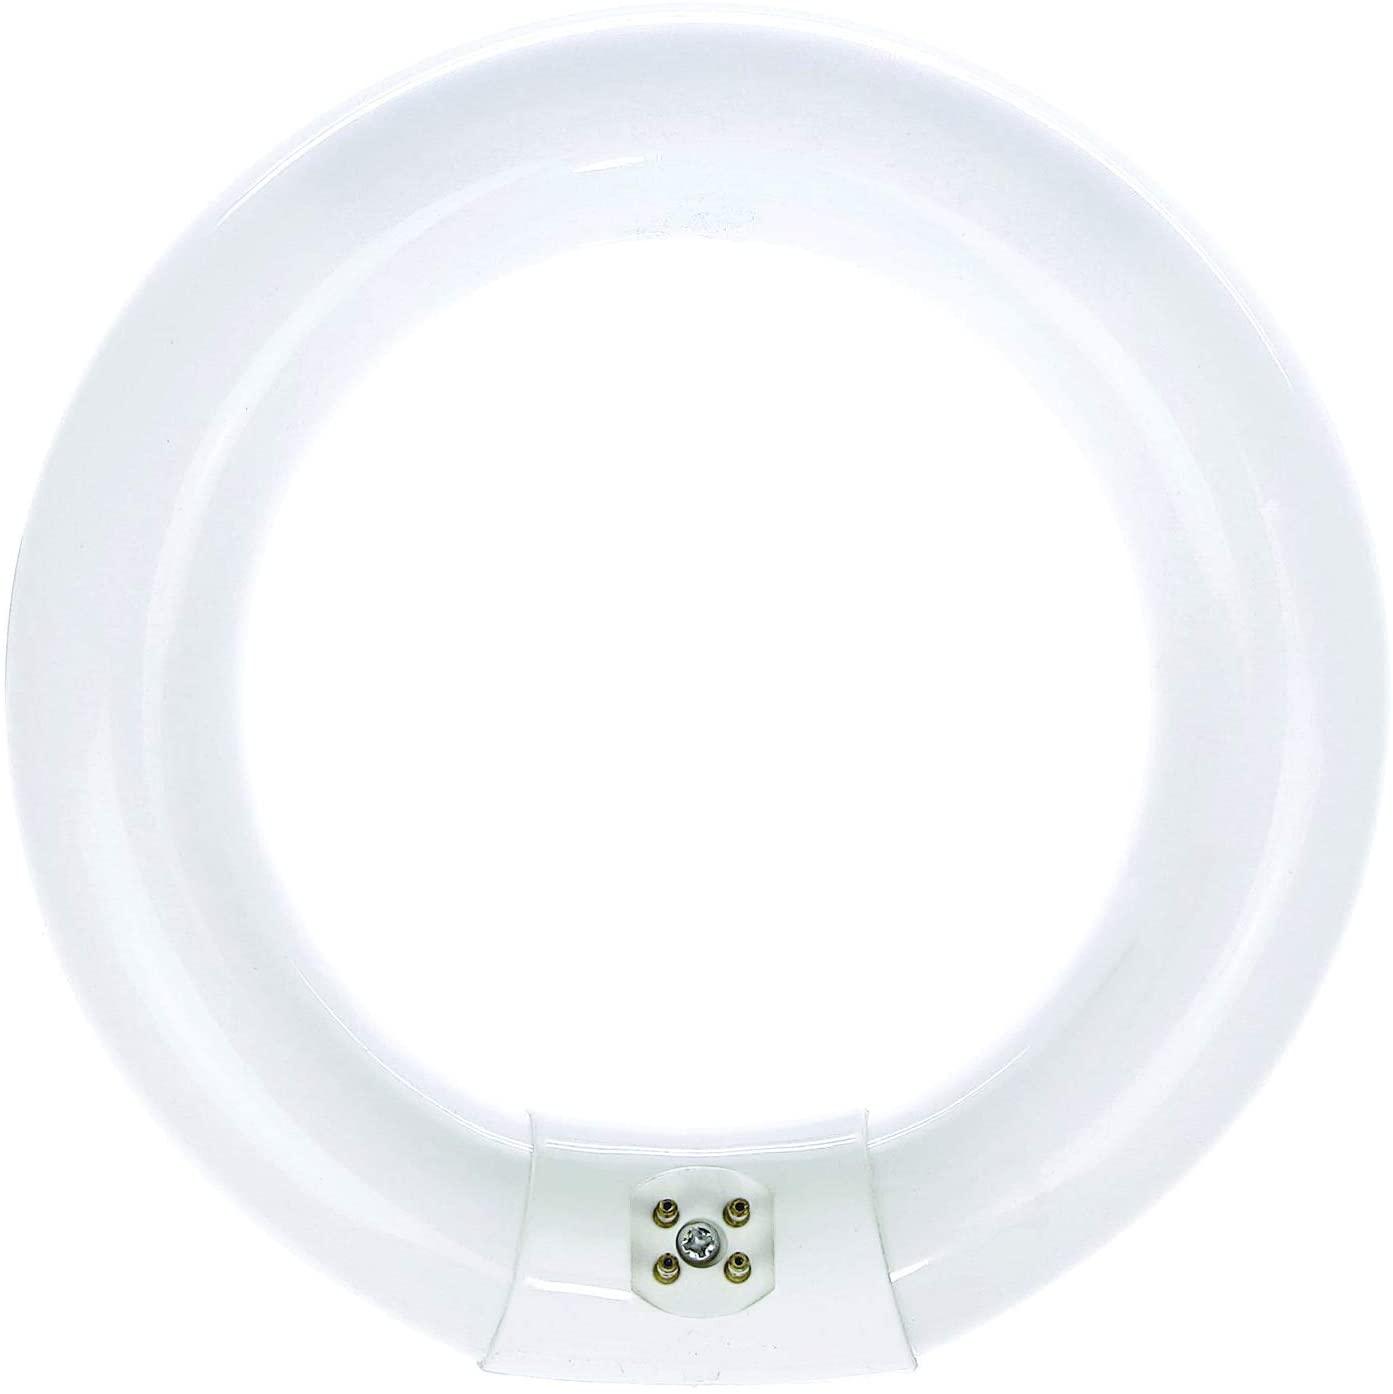 Luxrite LR20570 FC8T9/CW 22-Watt 8 Inch T9 Fluorescent Circular Light Bulb, Cool White 4100K, 1180 Lumens, G10Q 4-Pin Base